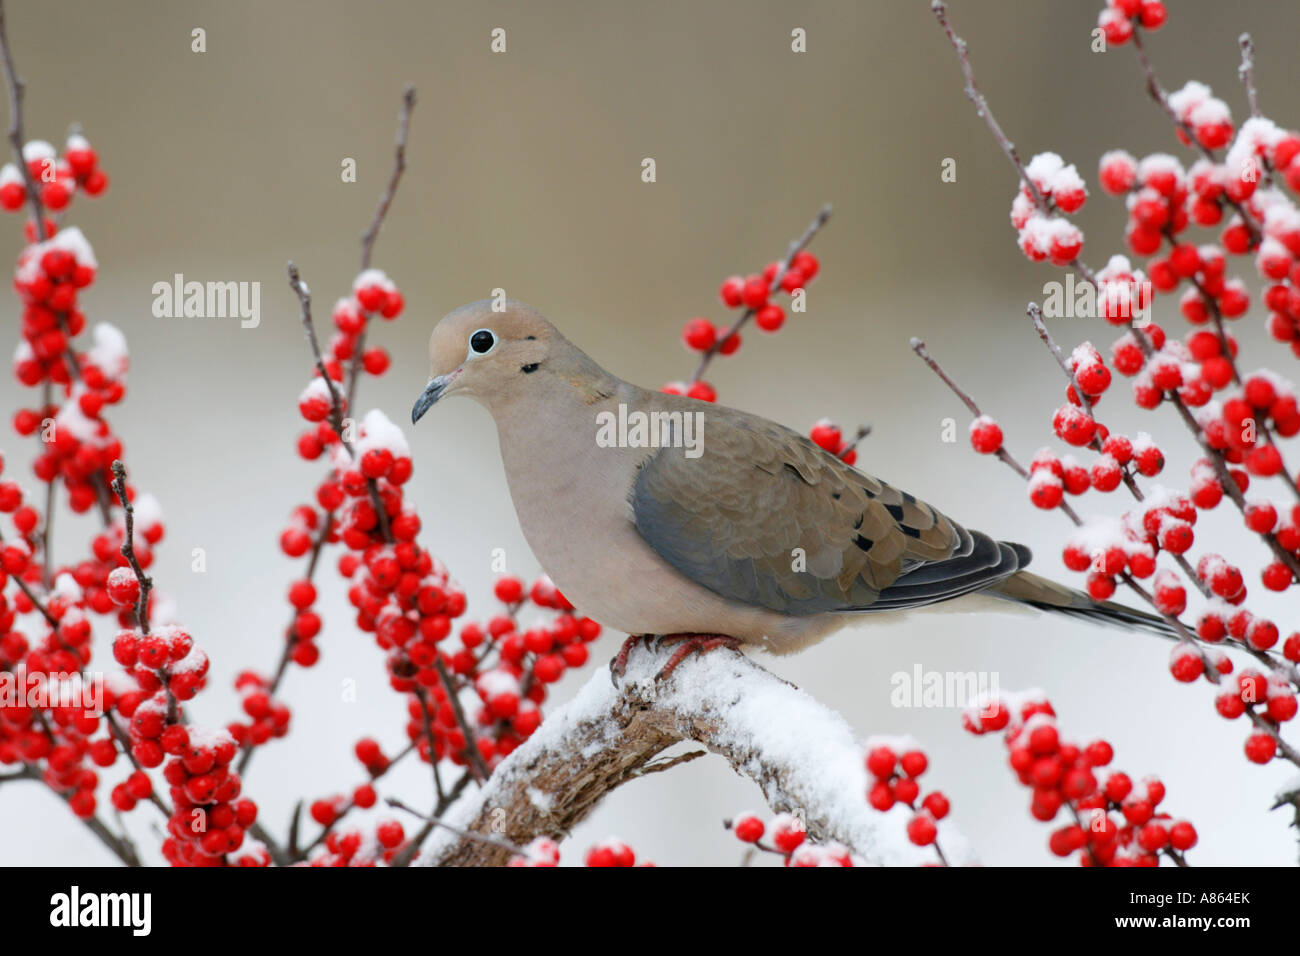 La Tourterelle triste entre Snowy Winterberry Photo Stock